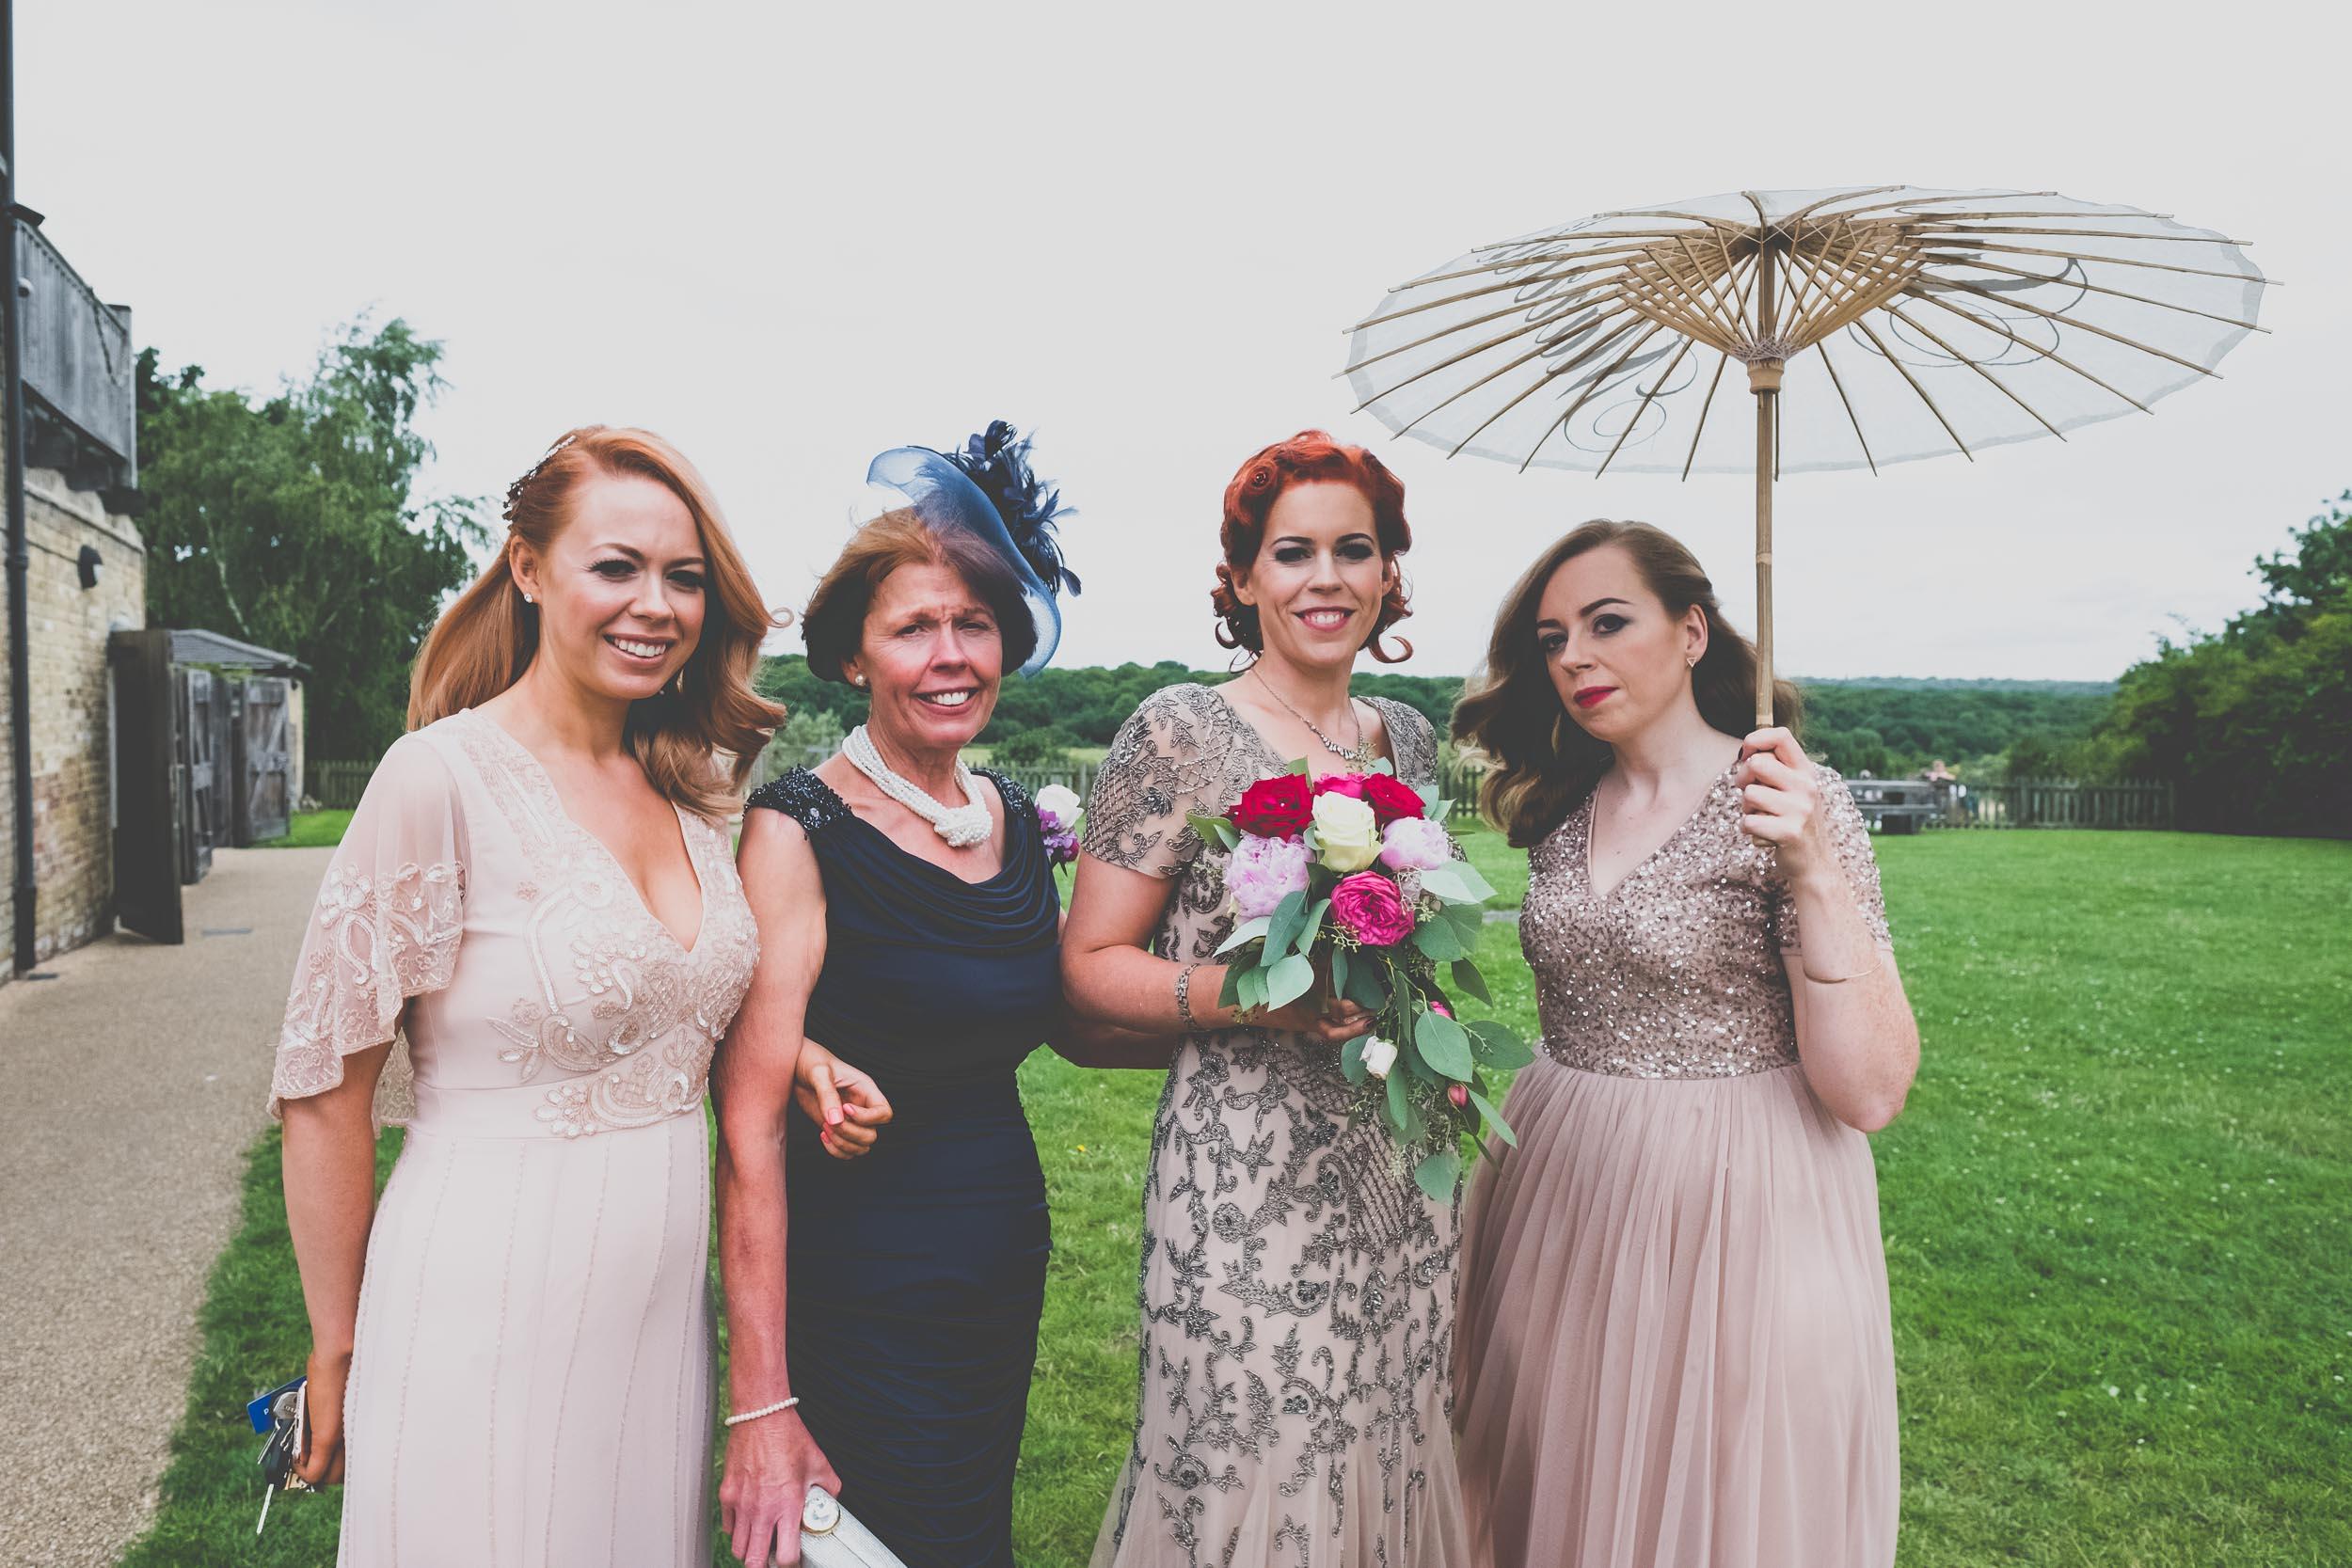 queen-elizabeths-hunting-lodge-epping-forest-wedding020.jpg